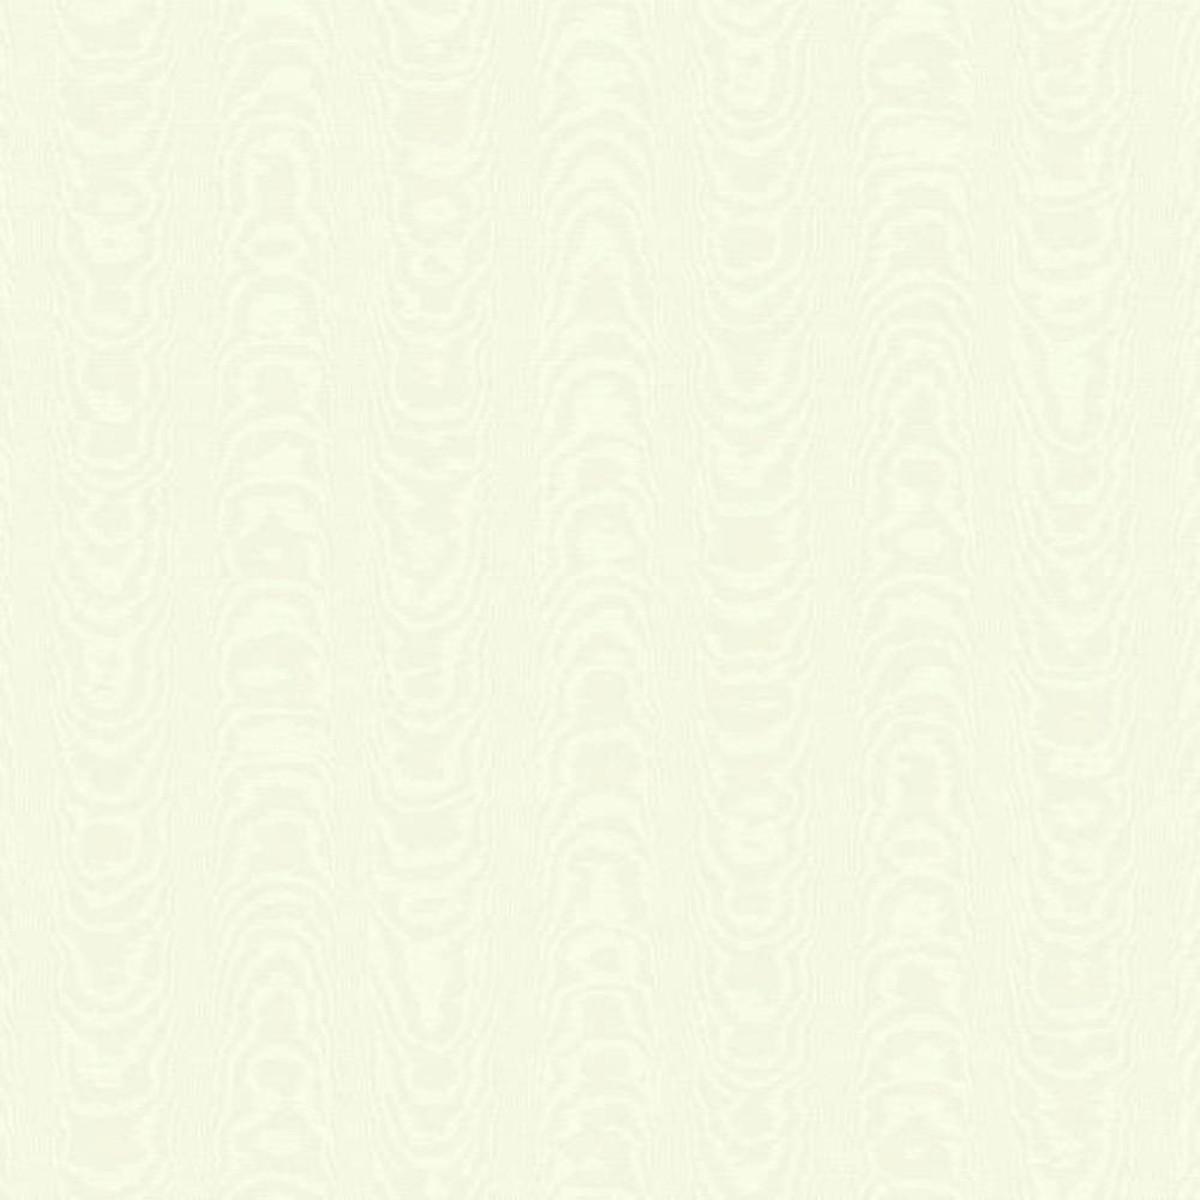 Обои бумажные York Wallcoverings Williamsburg зеленые WM2556 0.68 м